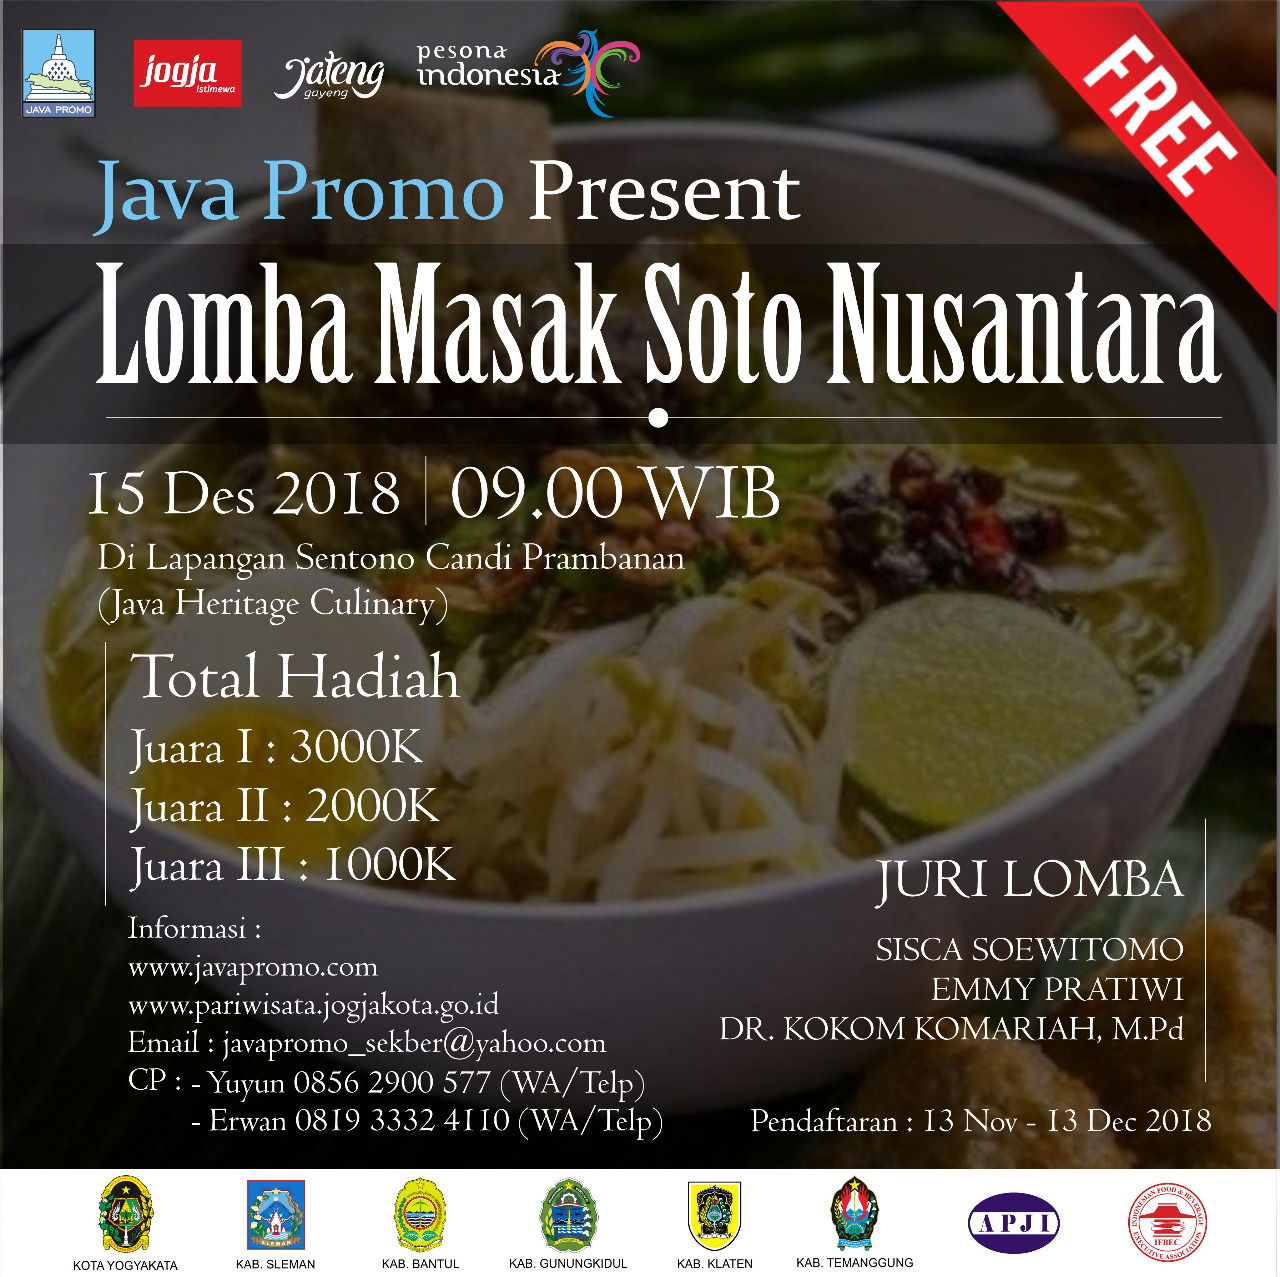 Lomba Masak Soto Nusantara